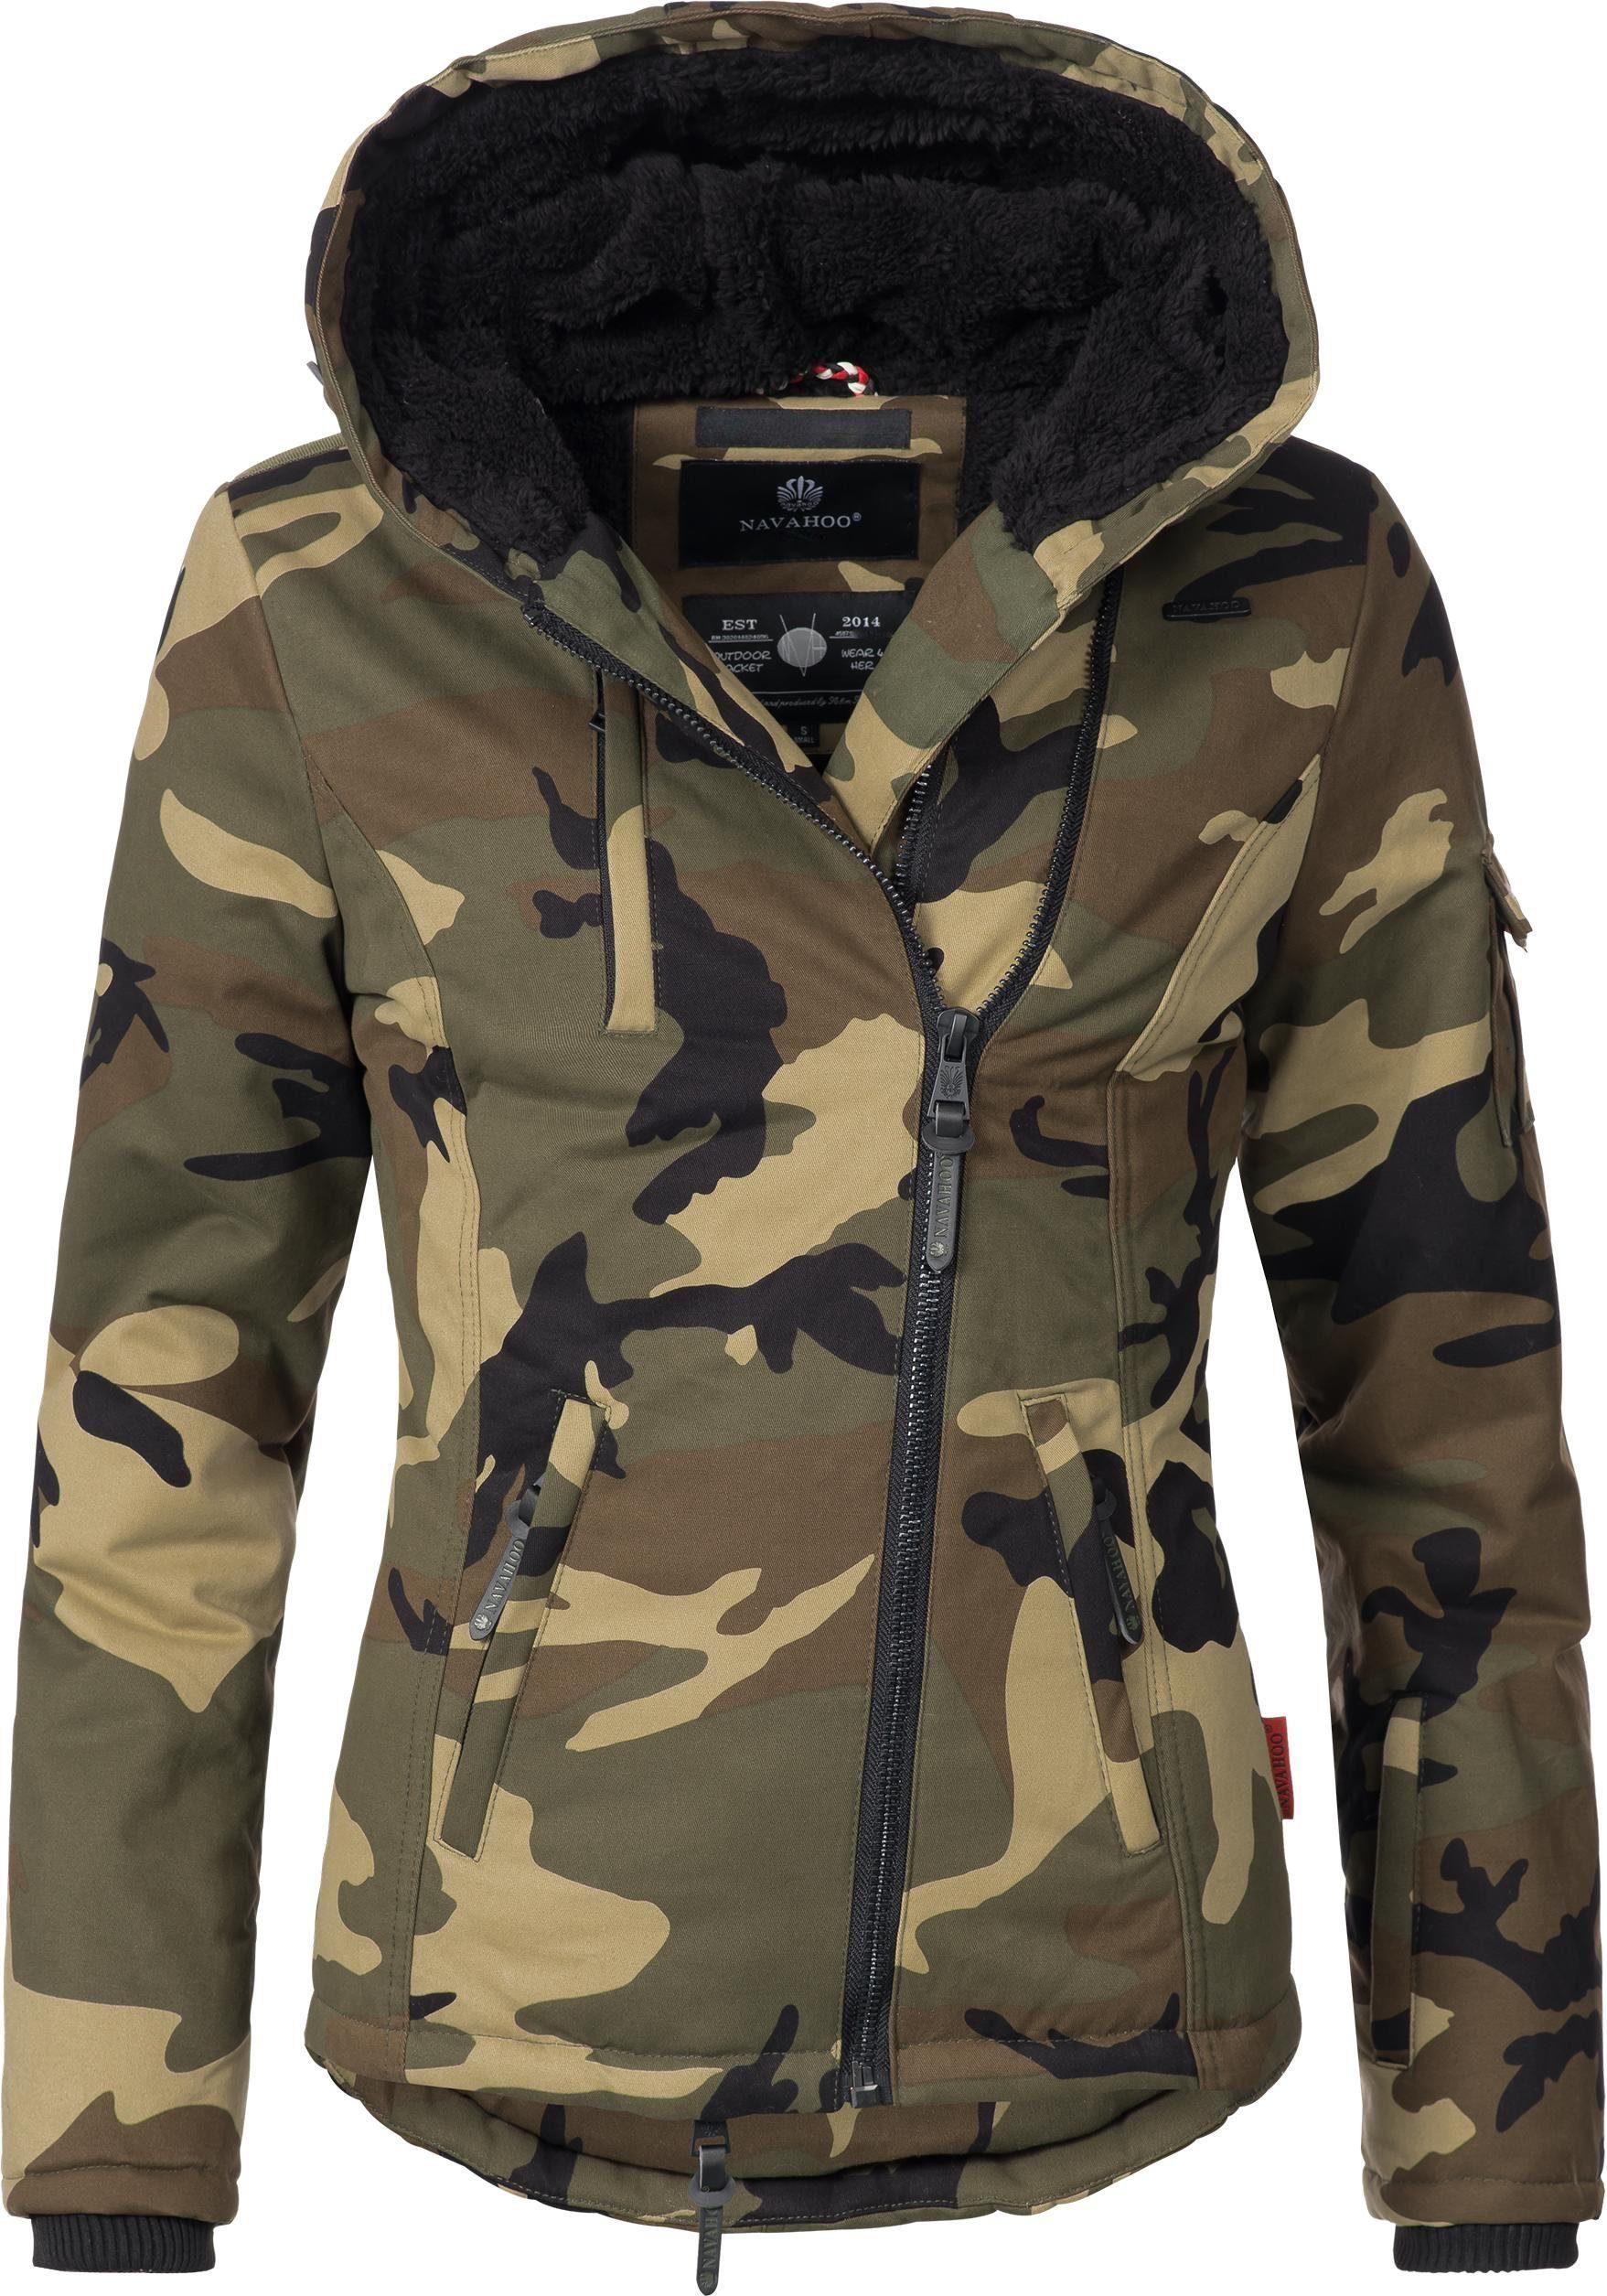 Winterjacke, Camouflage Print, Teddyfell